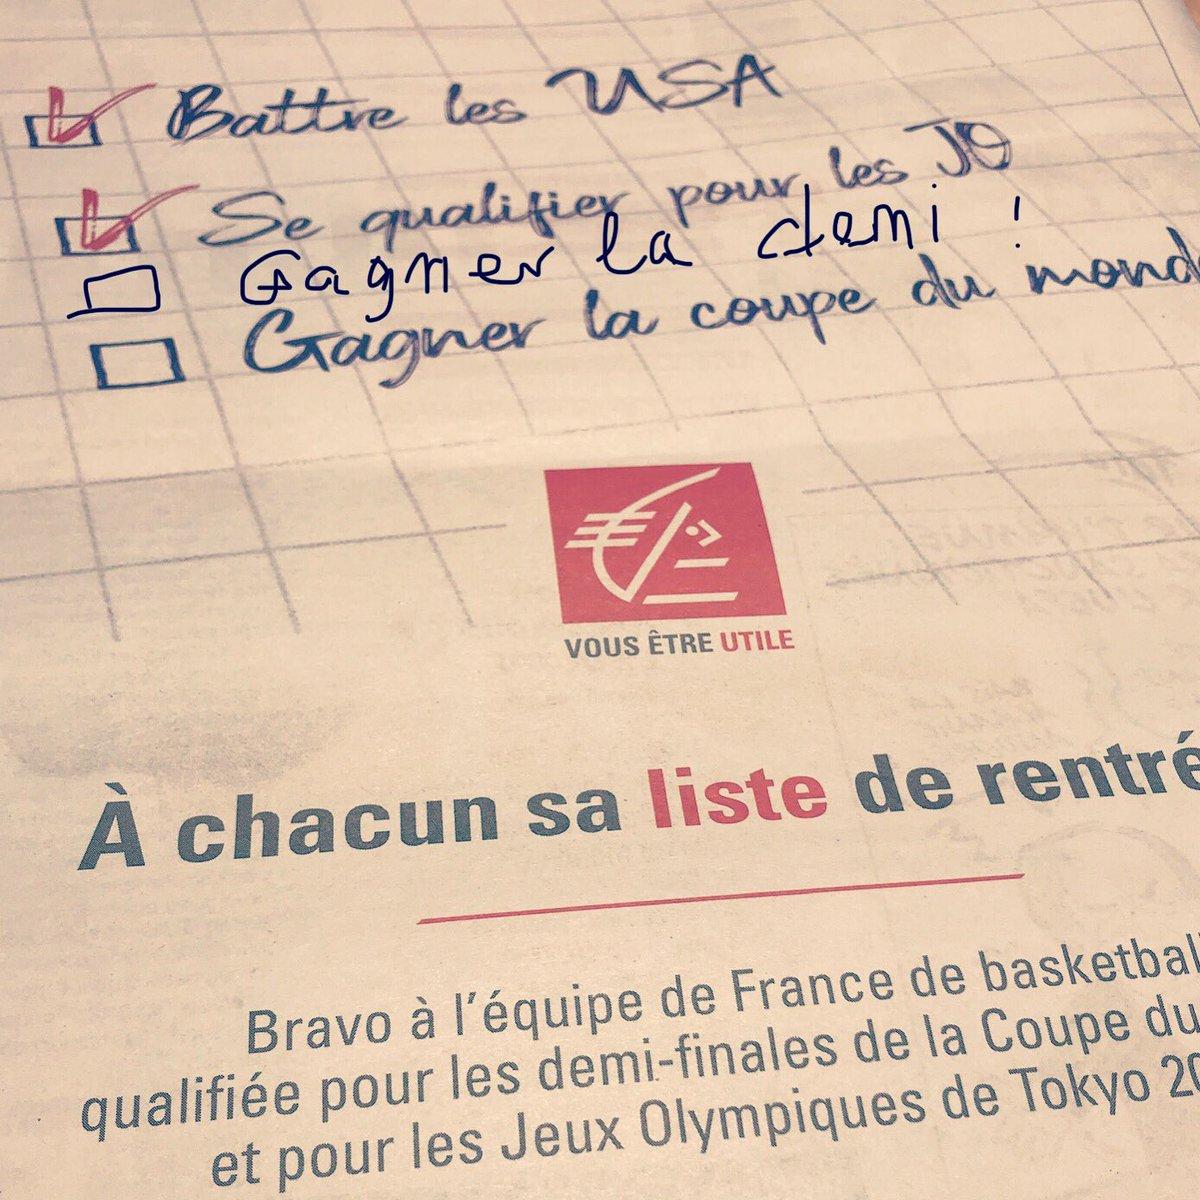 Step by step, la demi d'abord ! @ffbasketball @EspritBasket  #teamfrancebasket #fibawc #worldcup #basketball #caissedepargne #sportbuzzbusiness<br>http://pic.twitter.com/r4FAchv27j